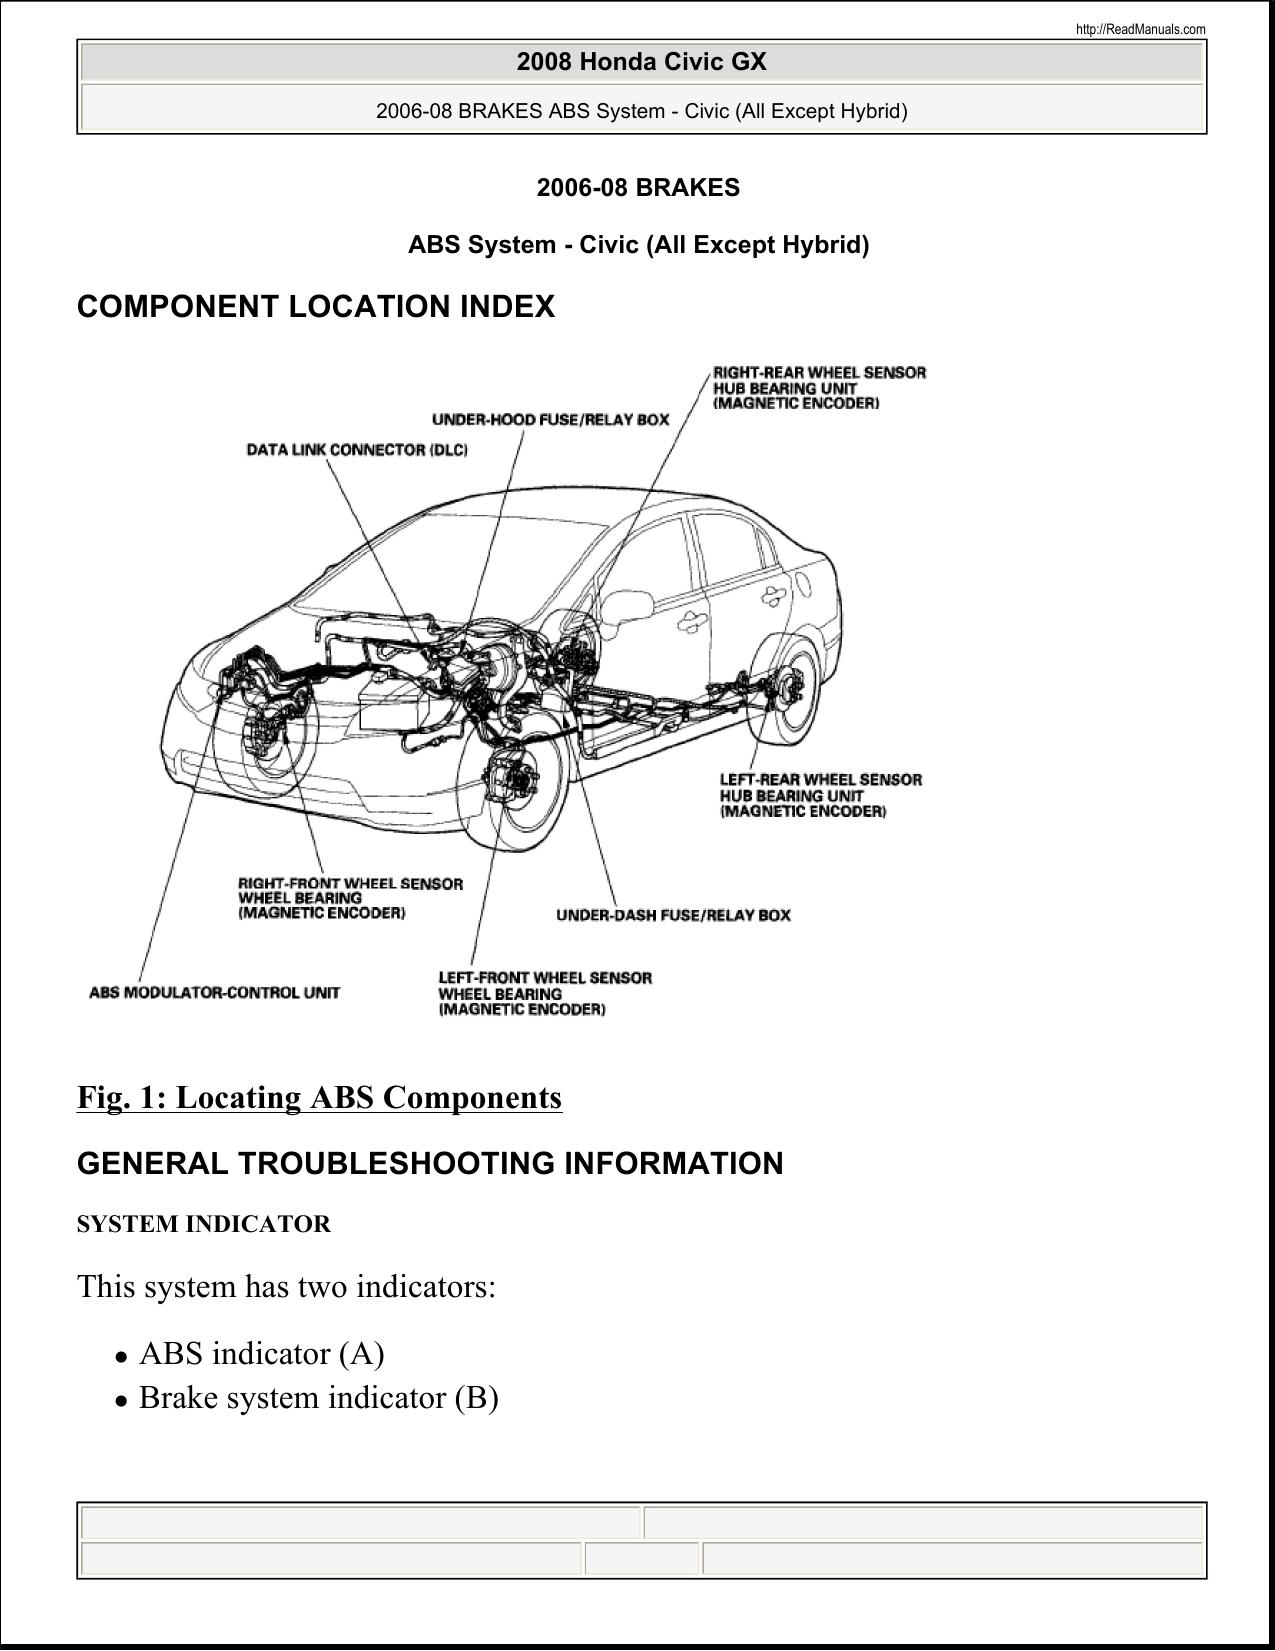 2009 Honda Civic Starter Location : honda, civic, starter, location, 2006-2009.Honda.Civic.Service.Manual